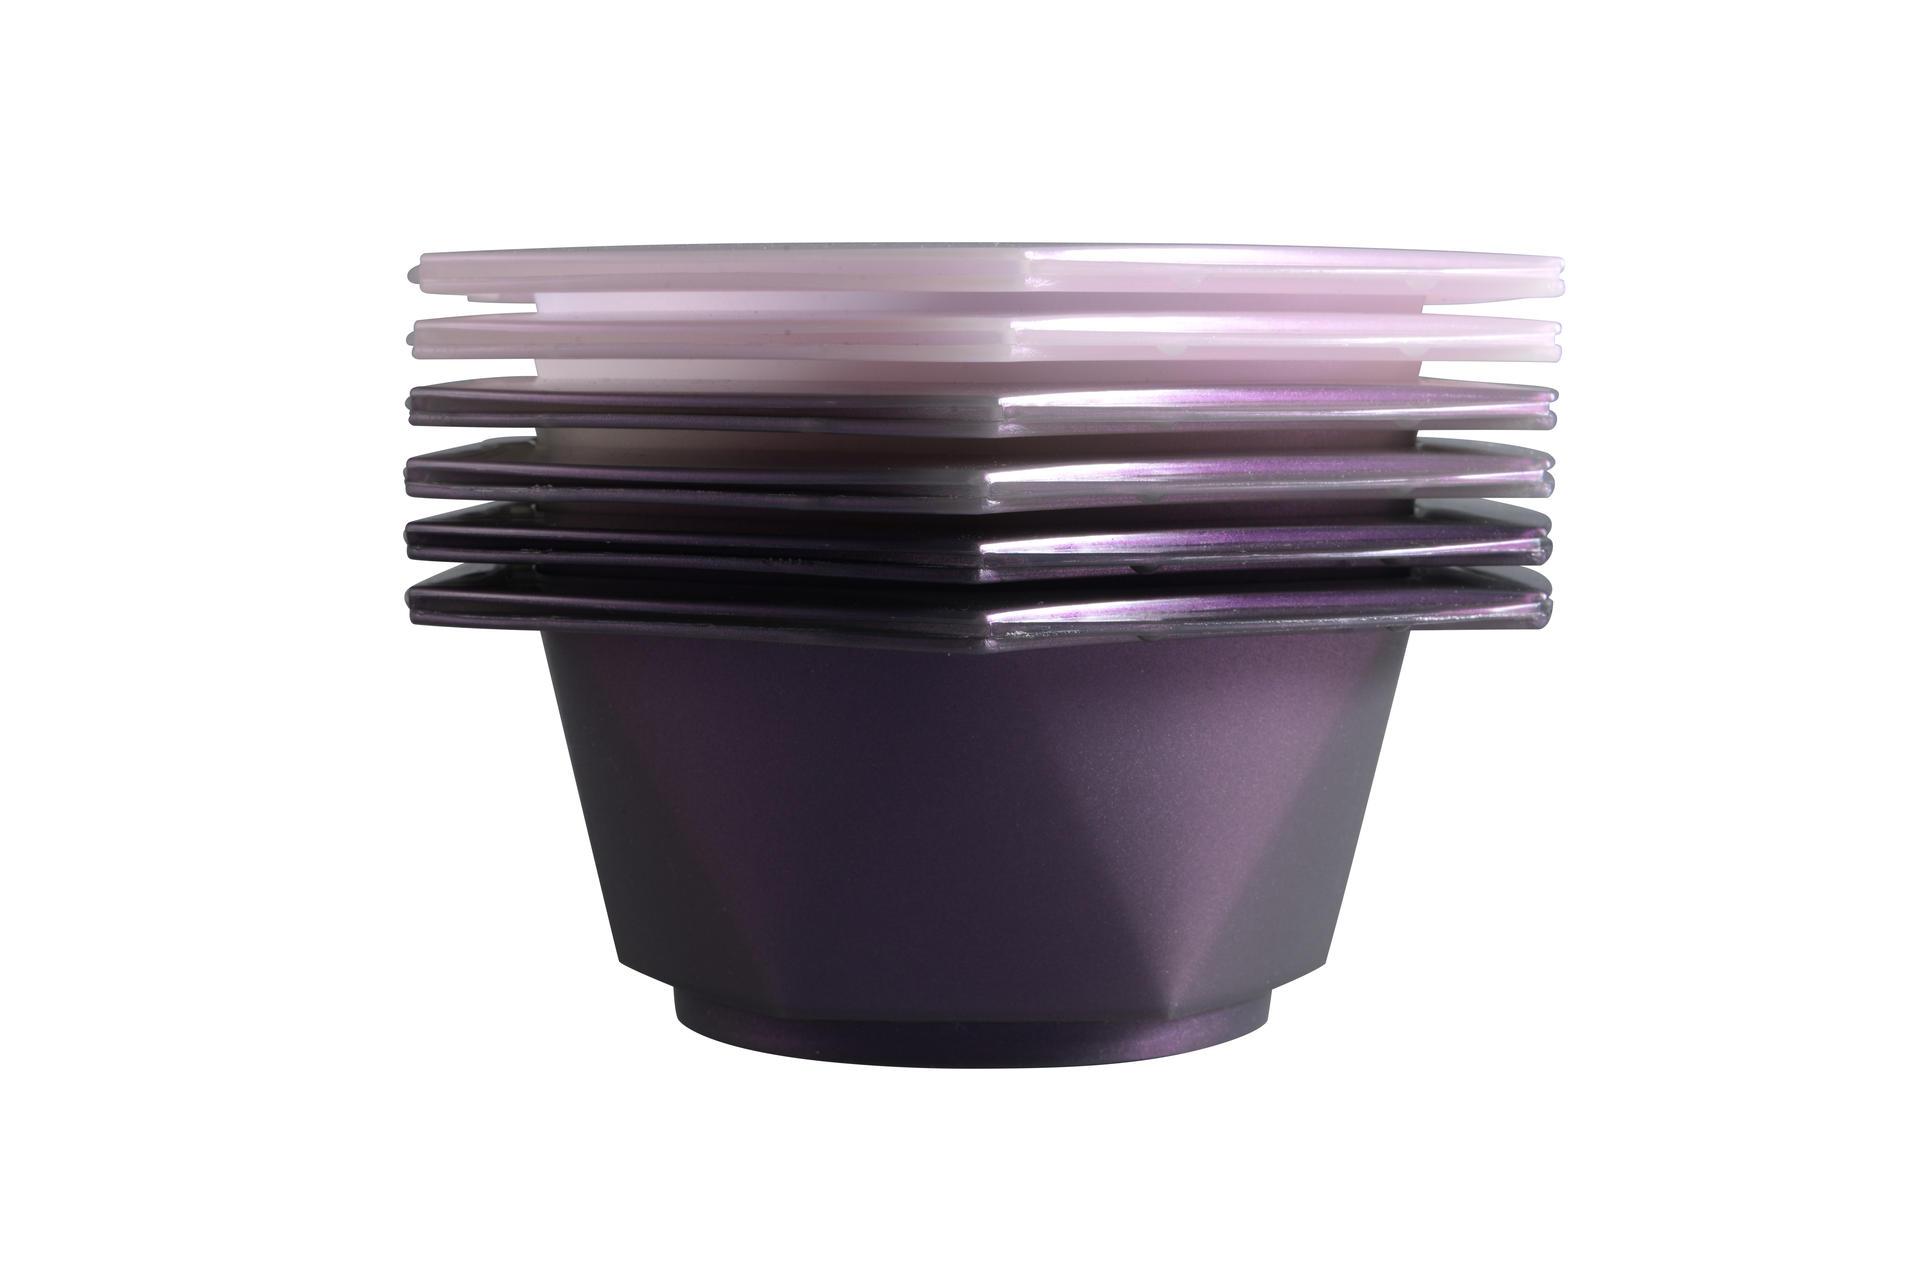 Professional salon barber hair tint bowl hair color mixing bowl